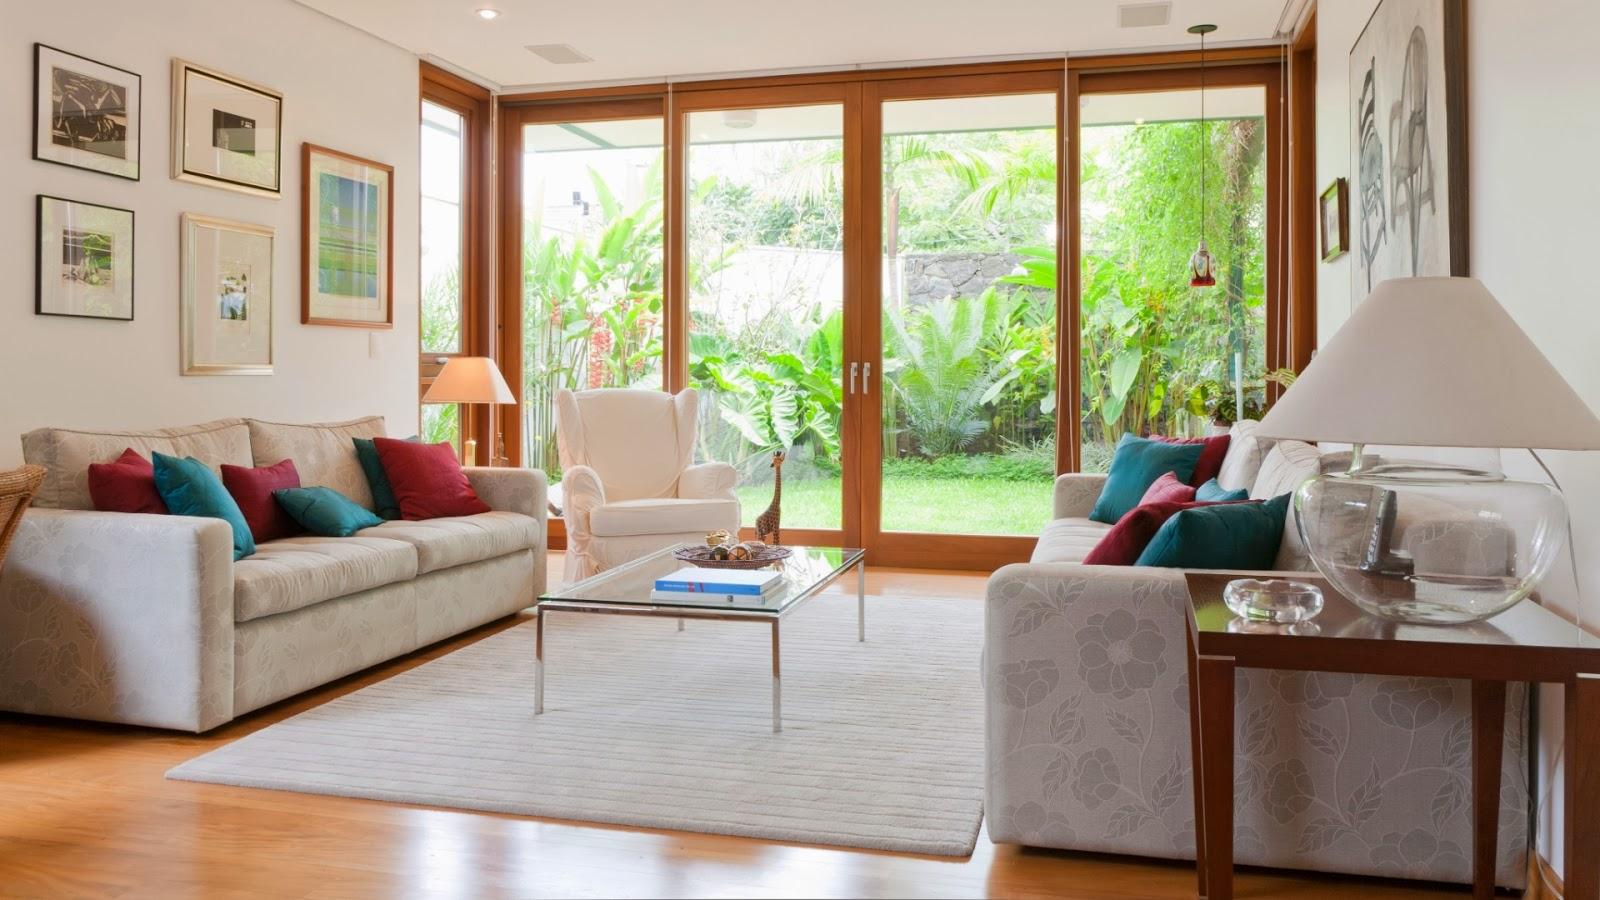 sofa-decoraca-moveis-santos-4